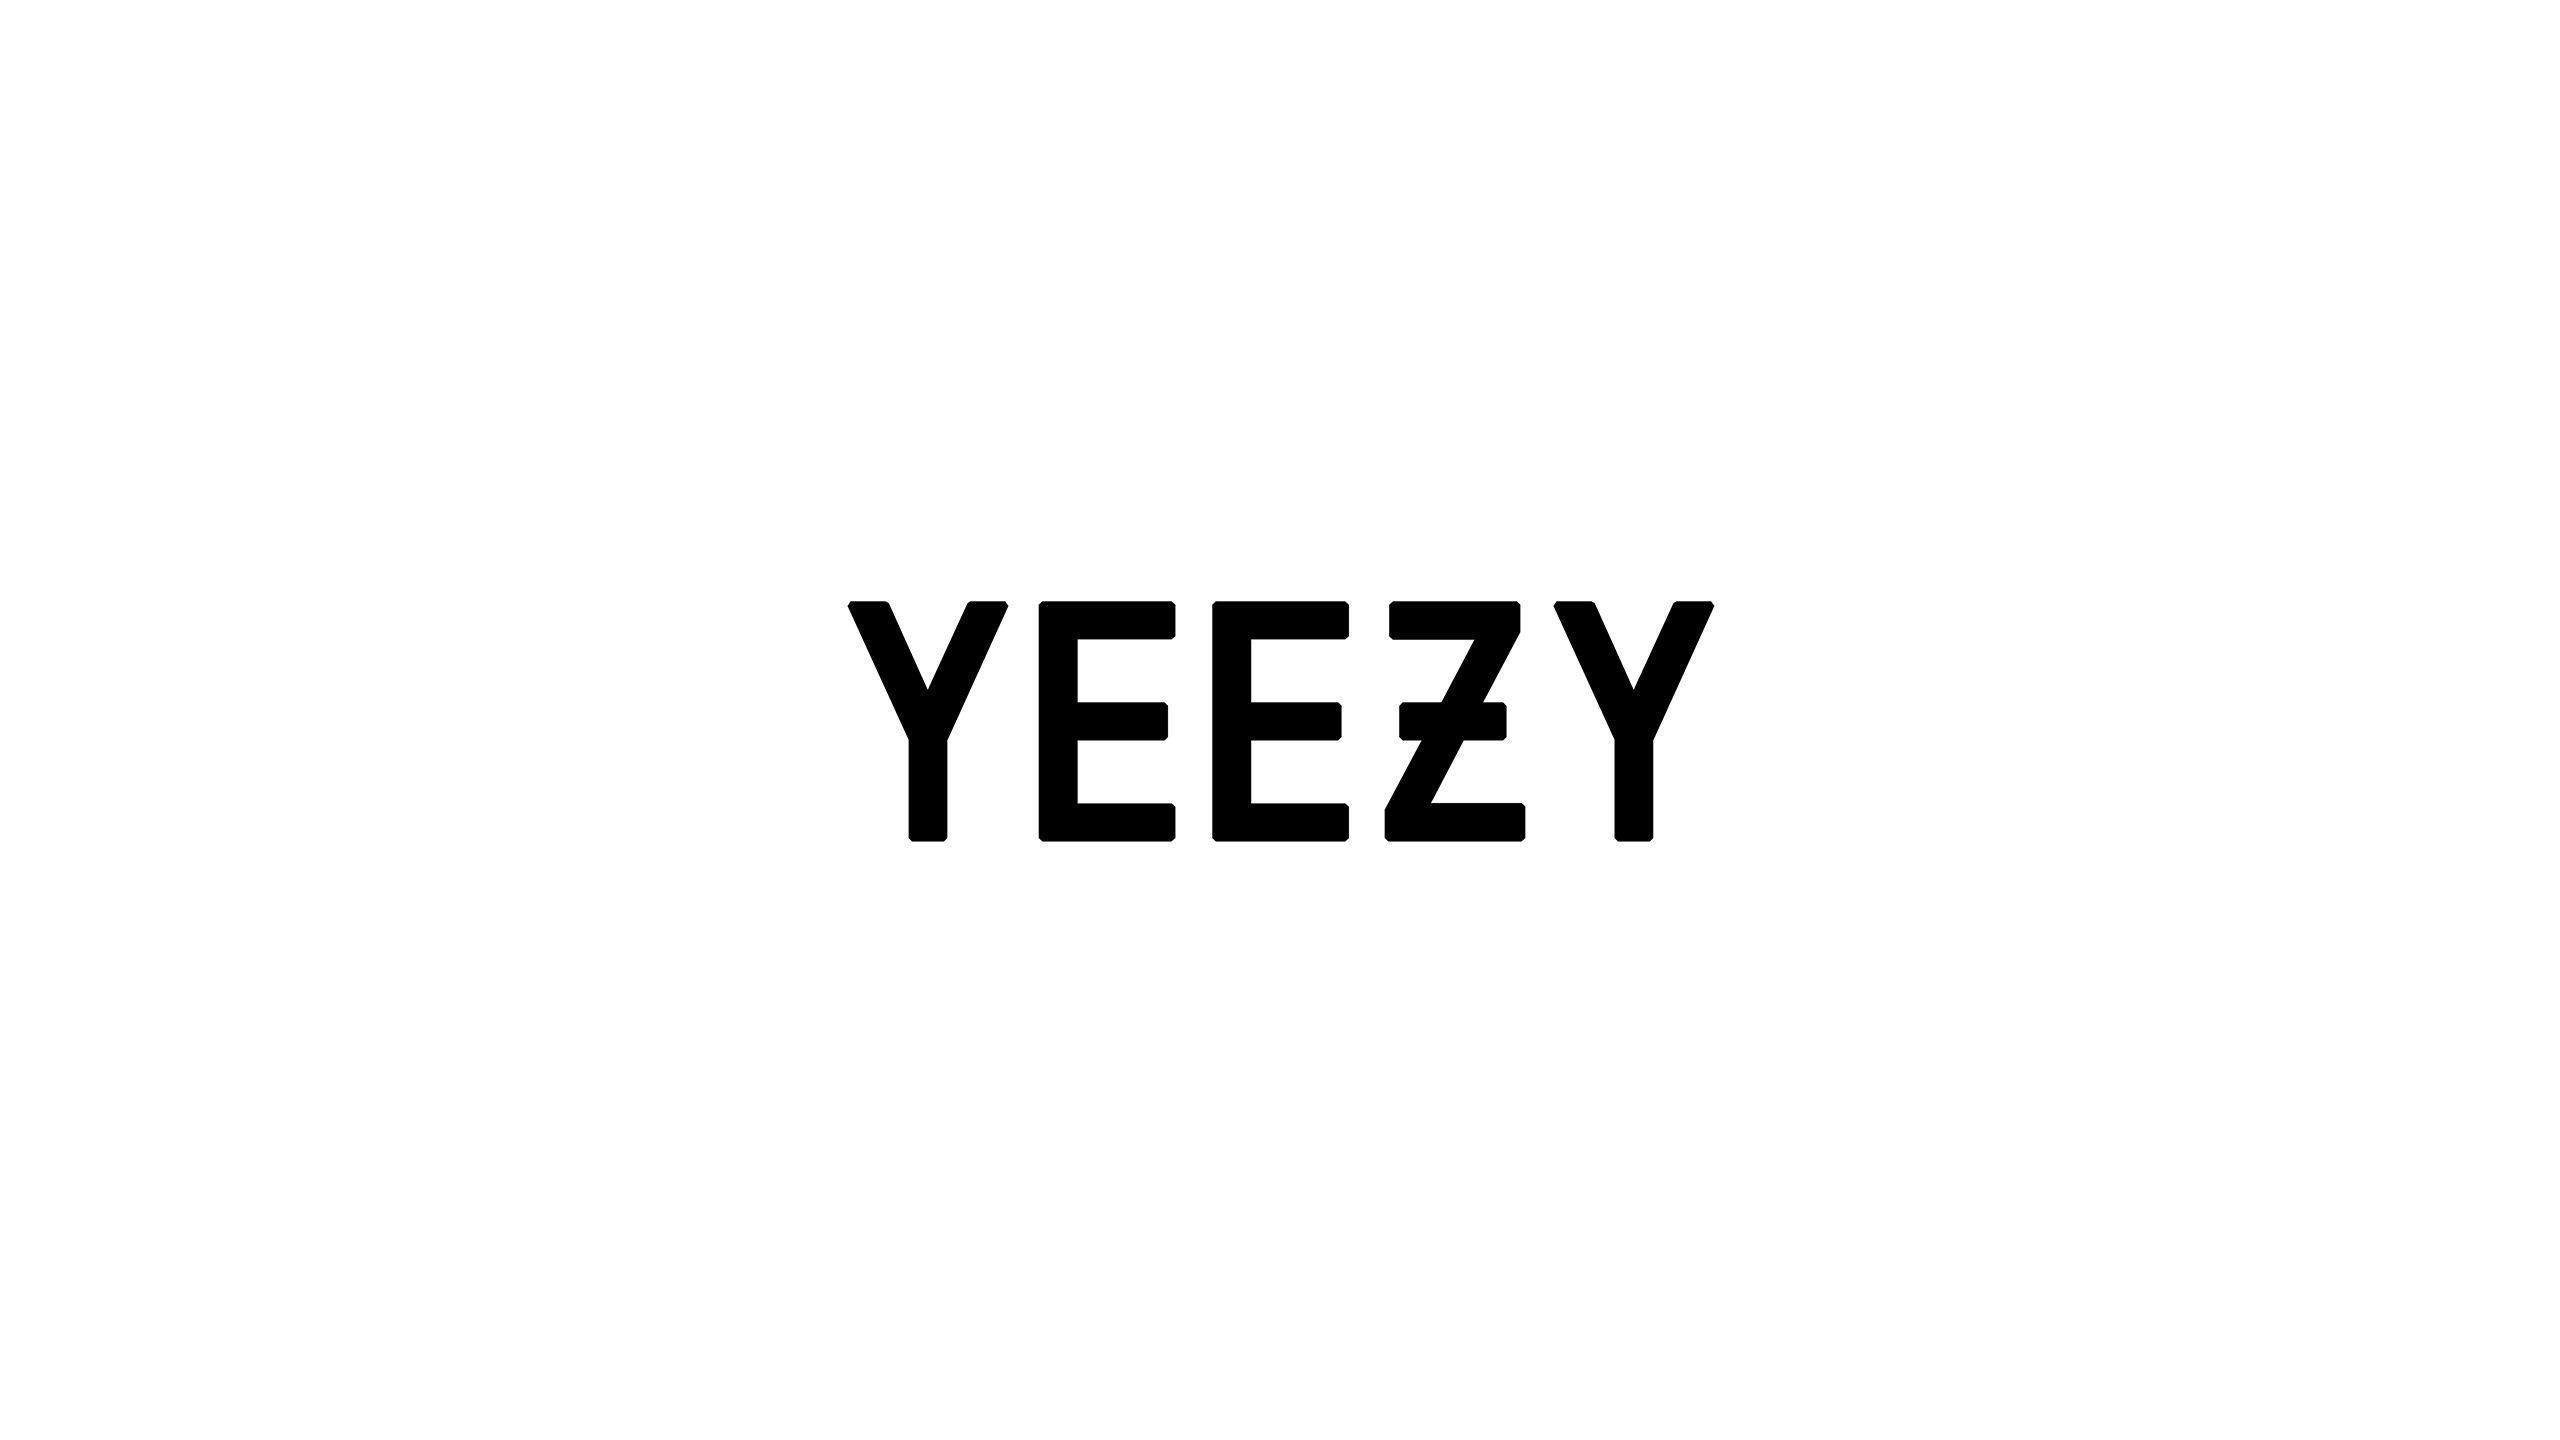 Yeezy Logo Wallpapers - Top Free Yeezy